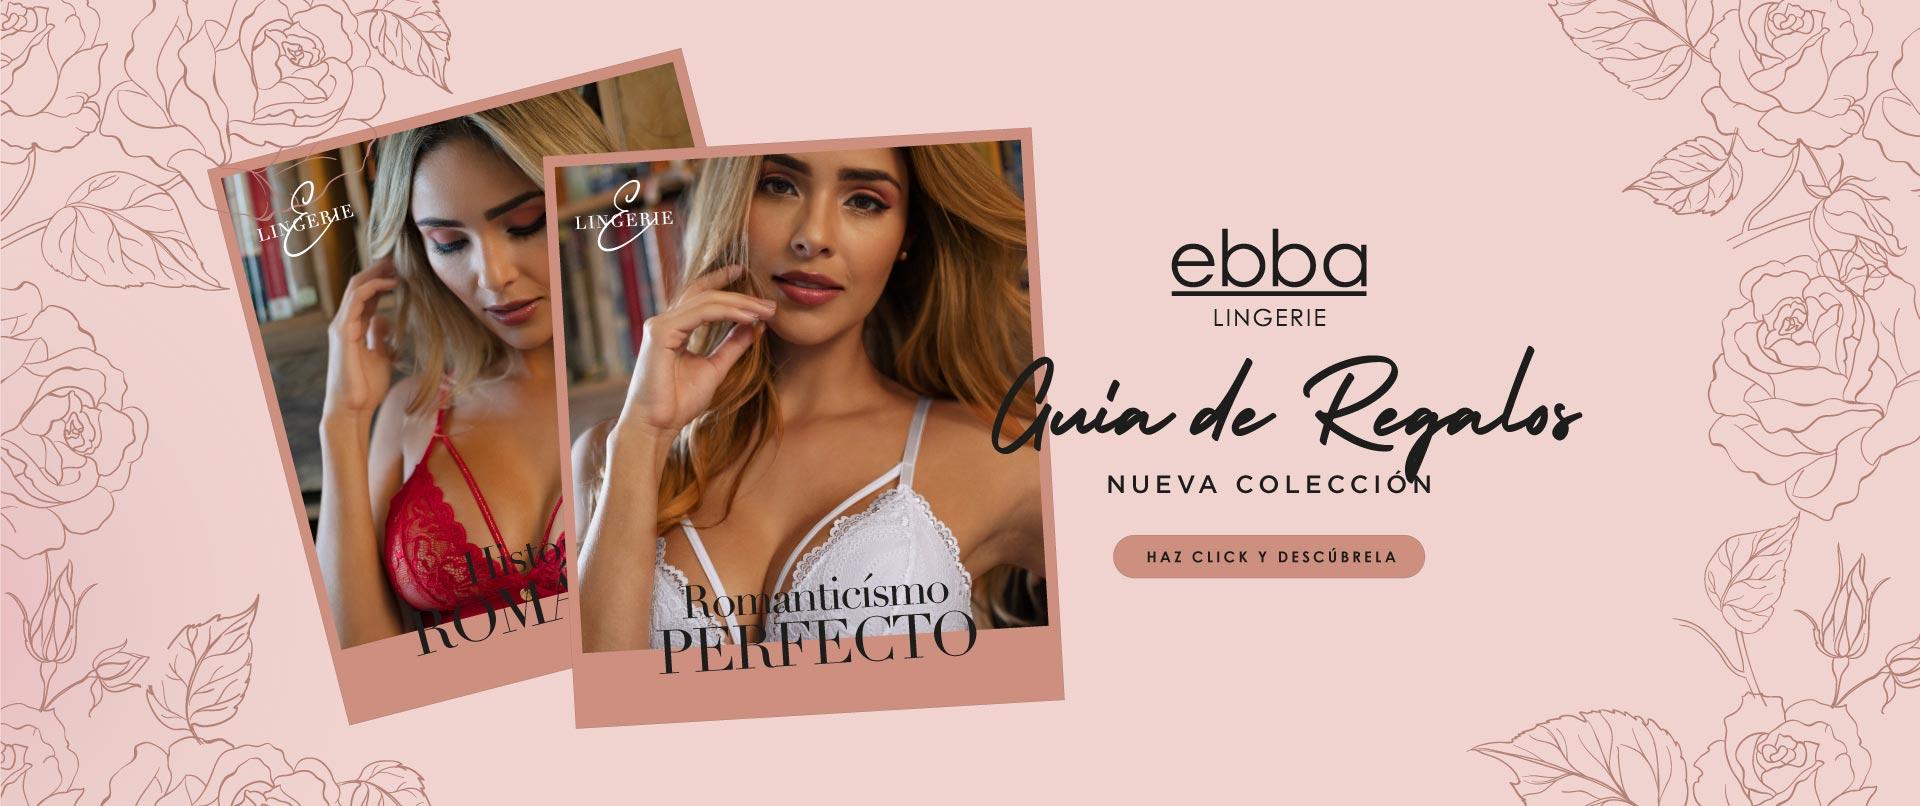 ebba-lingerie-venta-por-catalogo